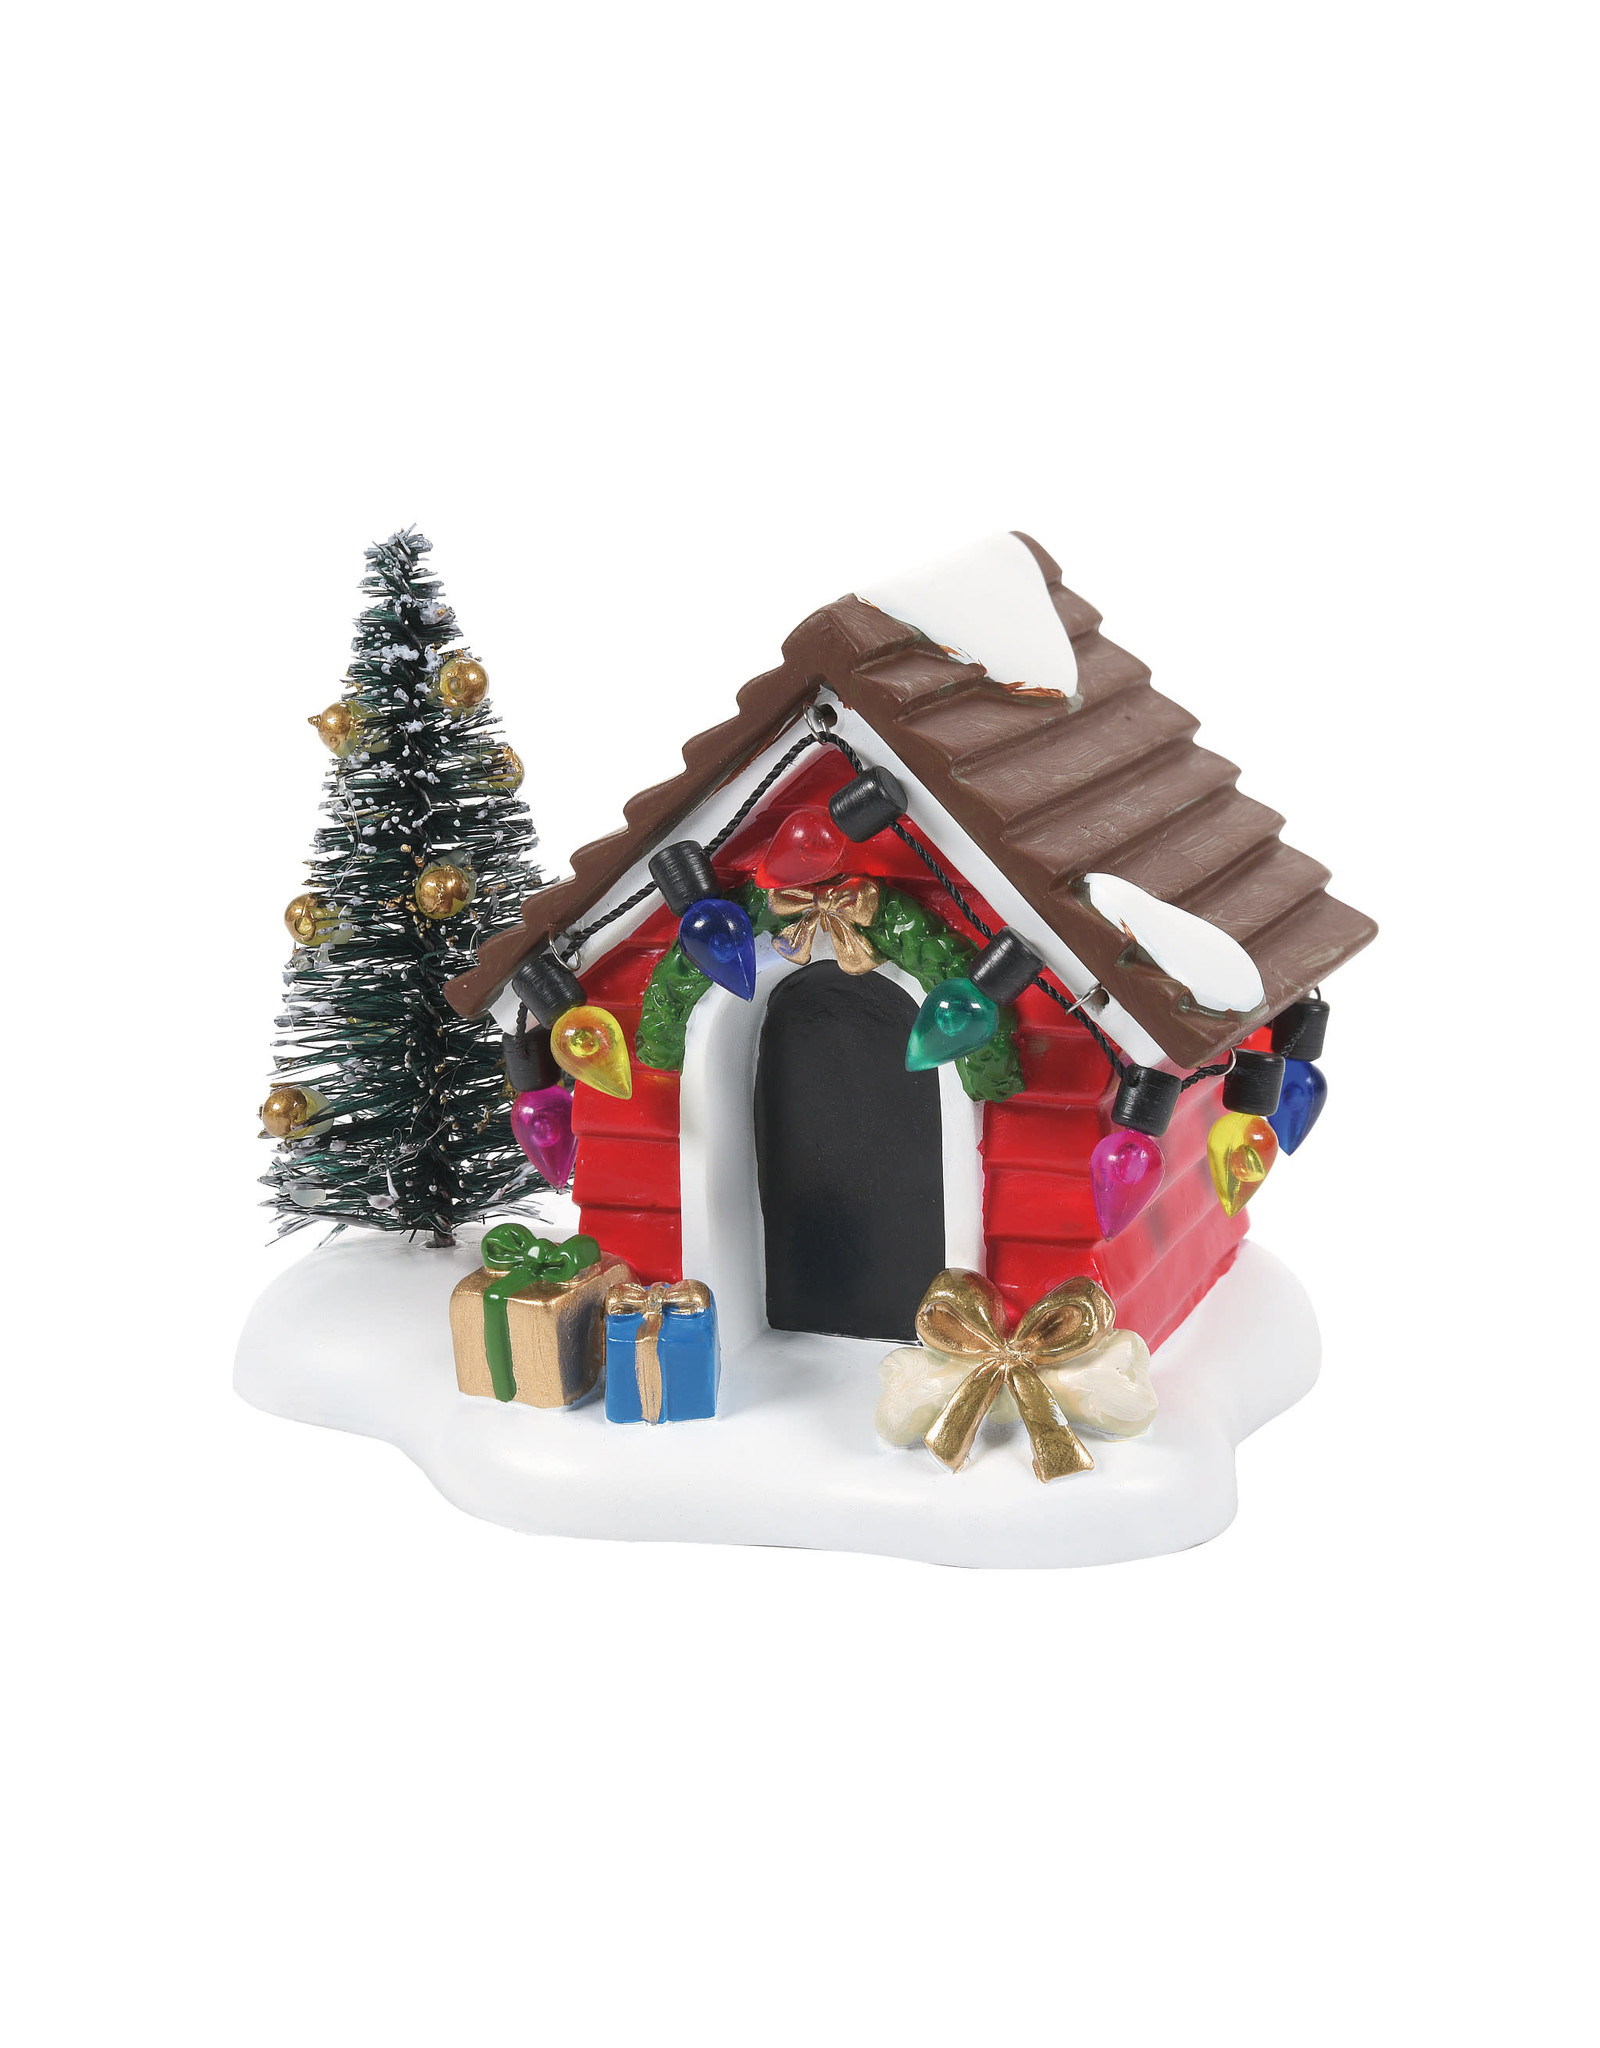 Enesco Fido's Christmas Getaway